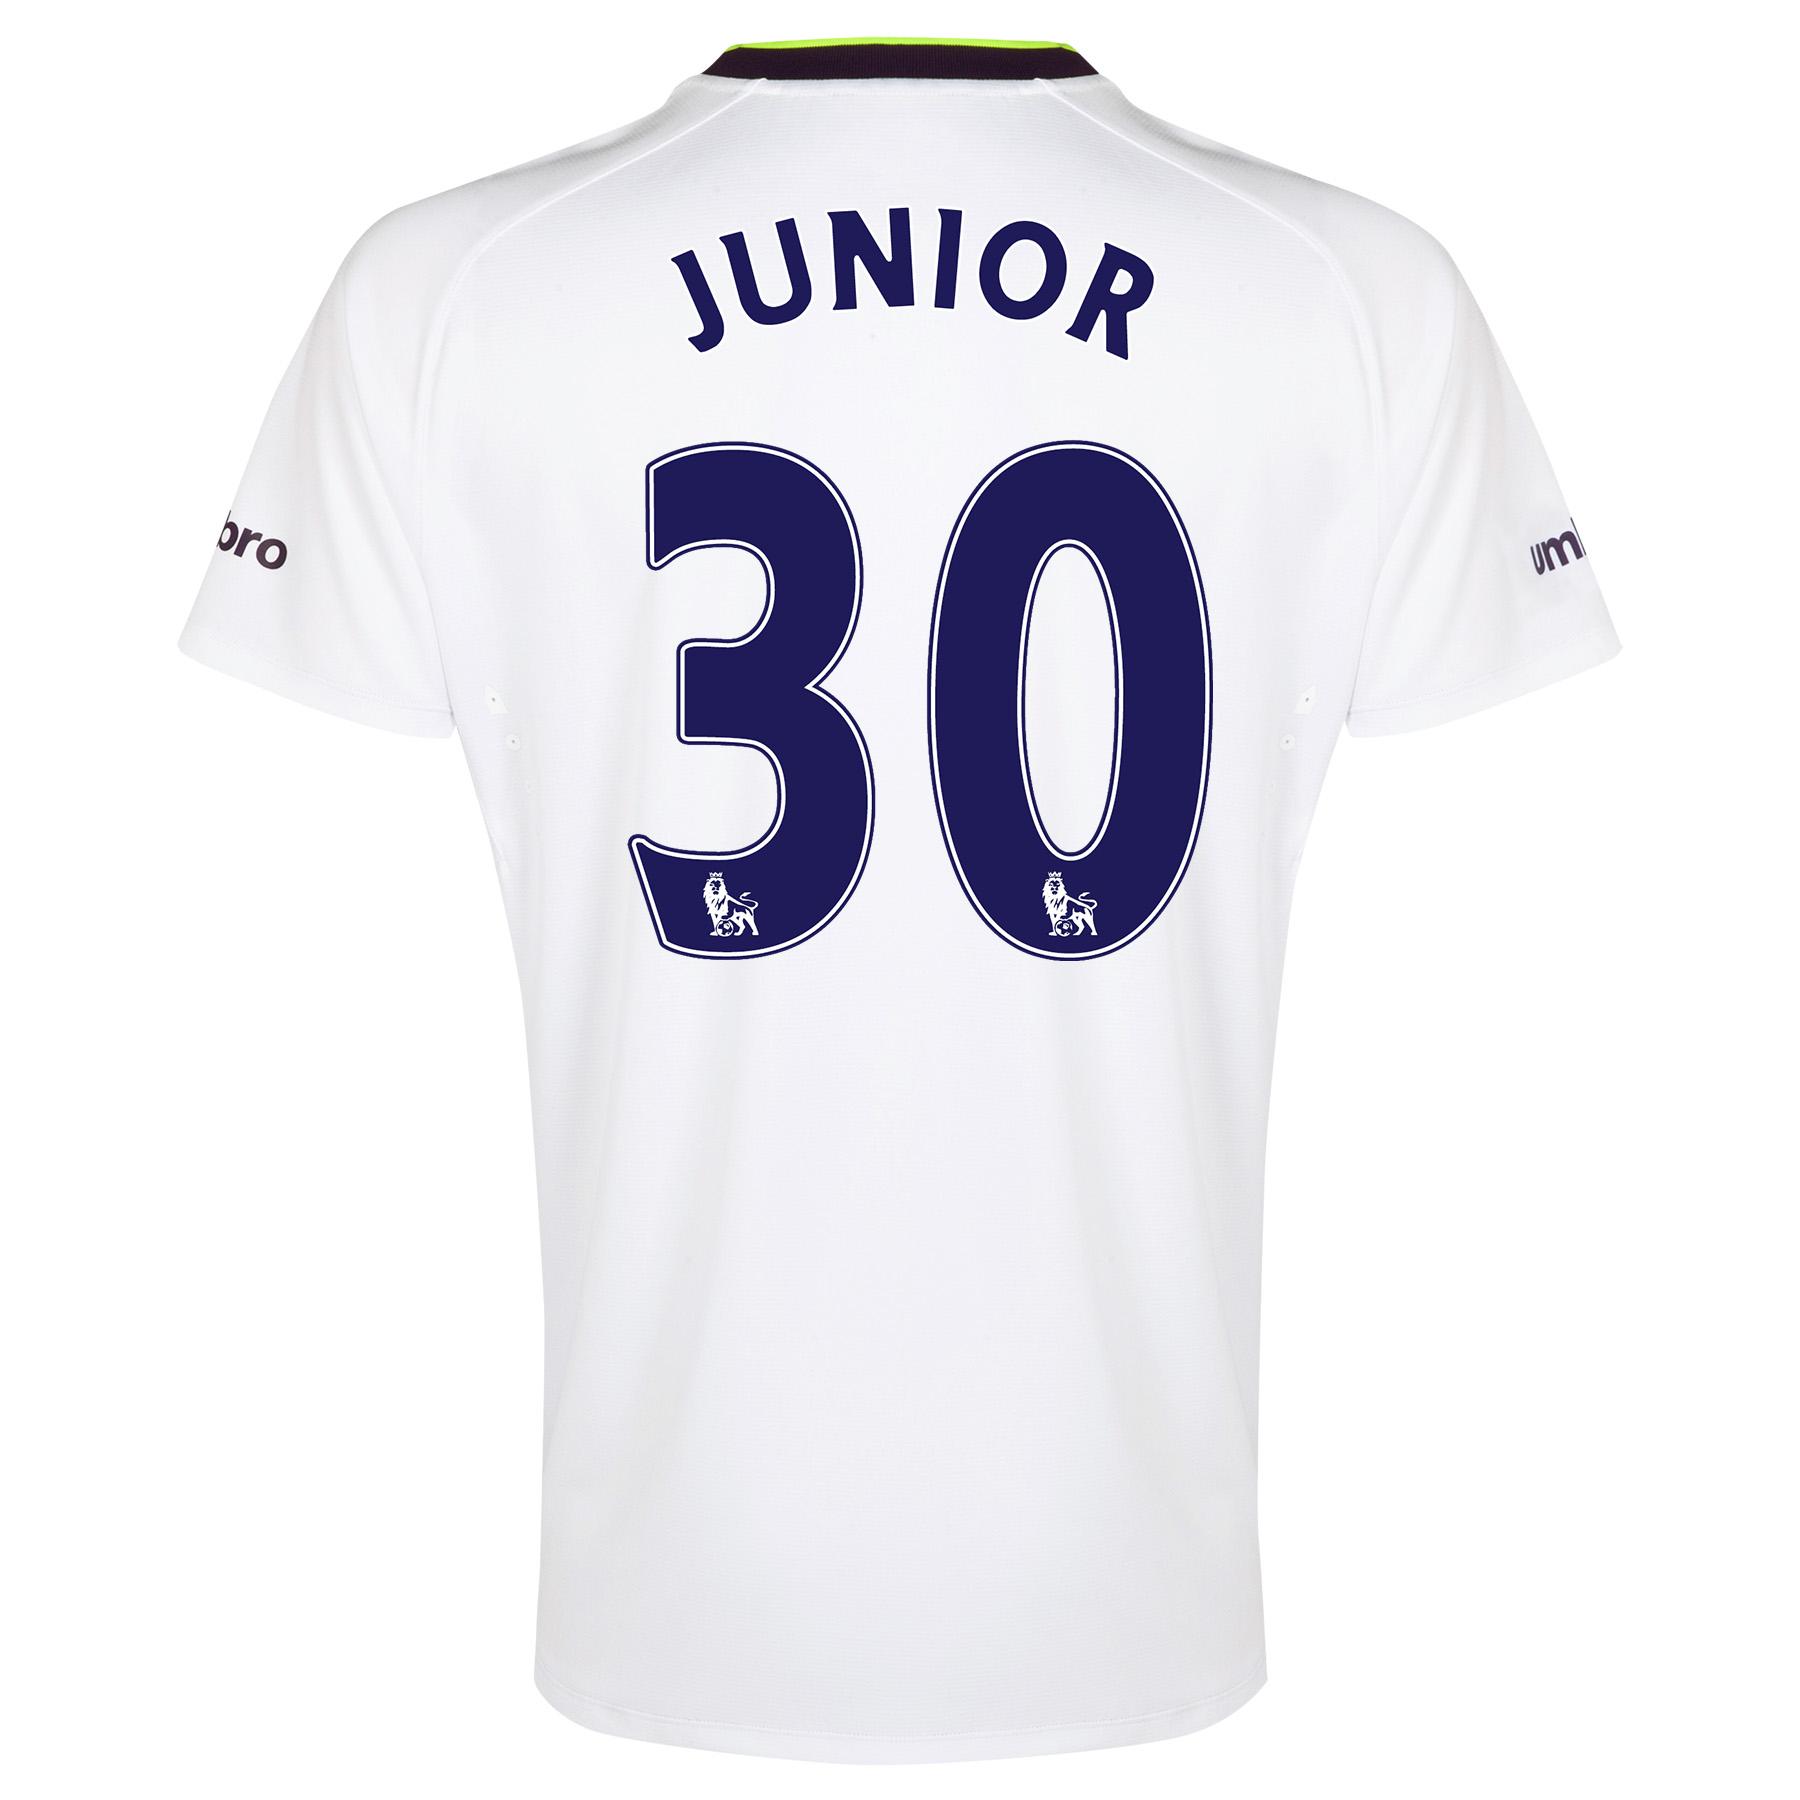 Everton SS 3rd Shirt  2014/15 with Junior 30 printing